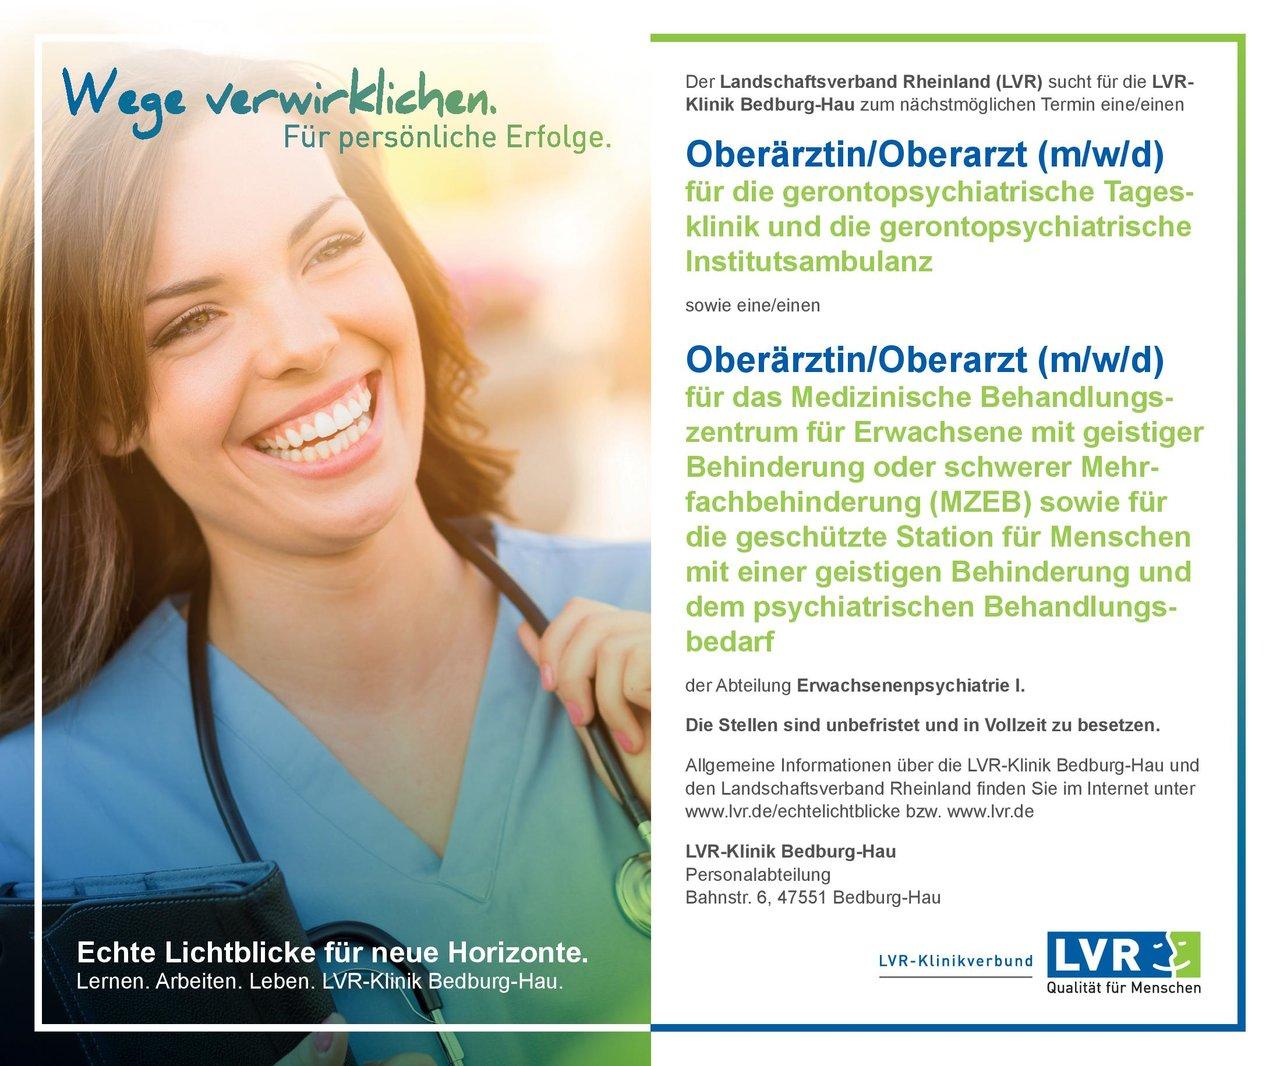 LVR-Klinik Bedburg-Hau Oberärztin/Oberarzt (m/w/d) für die gerontopsychiatrische Tagesklinik und die gerontopsychiatrische Institutsambulanz  Psychiatrie und Psychotherapie, Psychiatrie und Psychotherapie Oberarzt